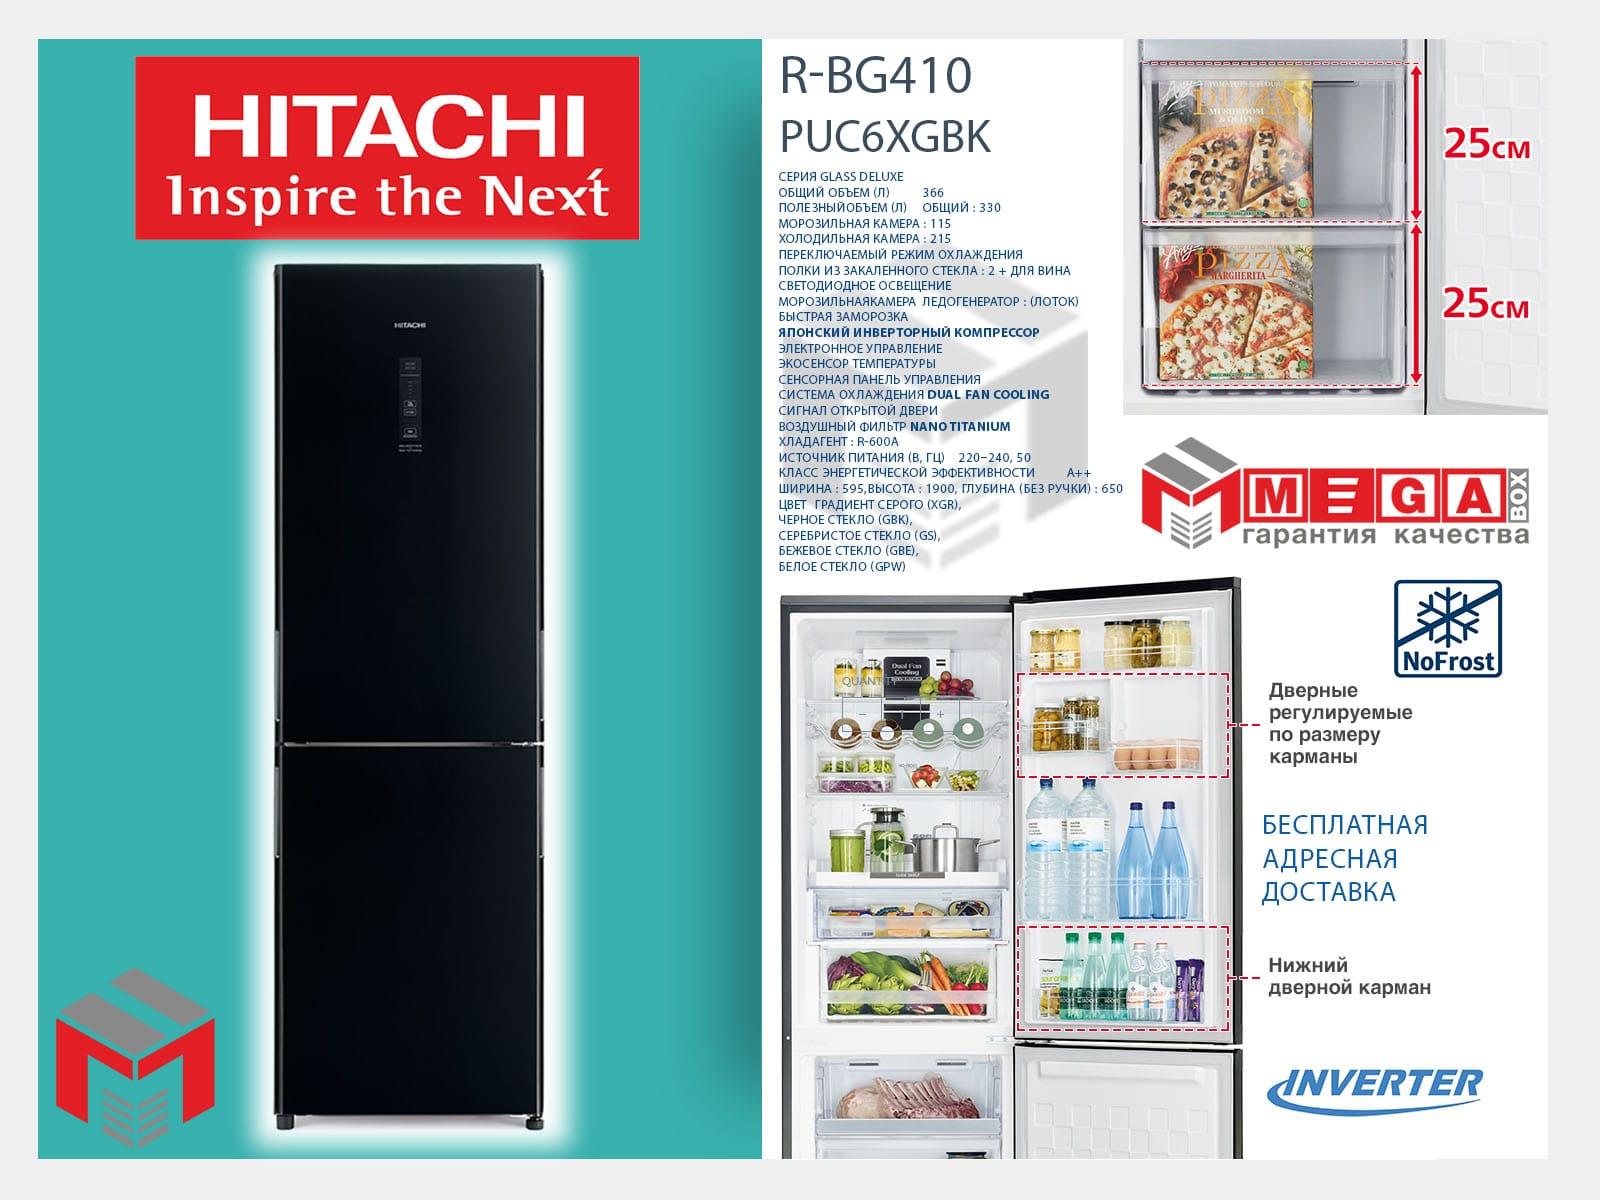 BG410XGBK-min Холодильник Hitachi R-BG410PUC6XGBK